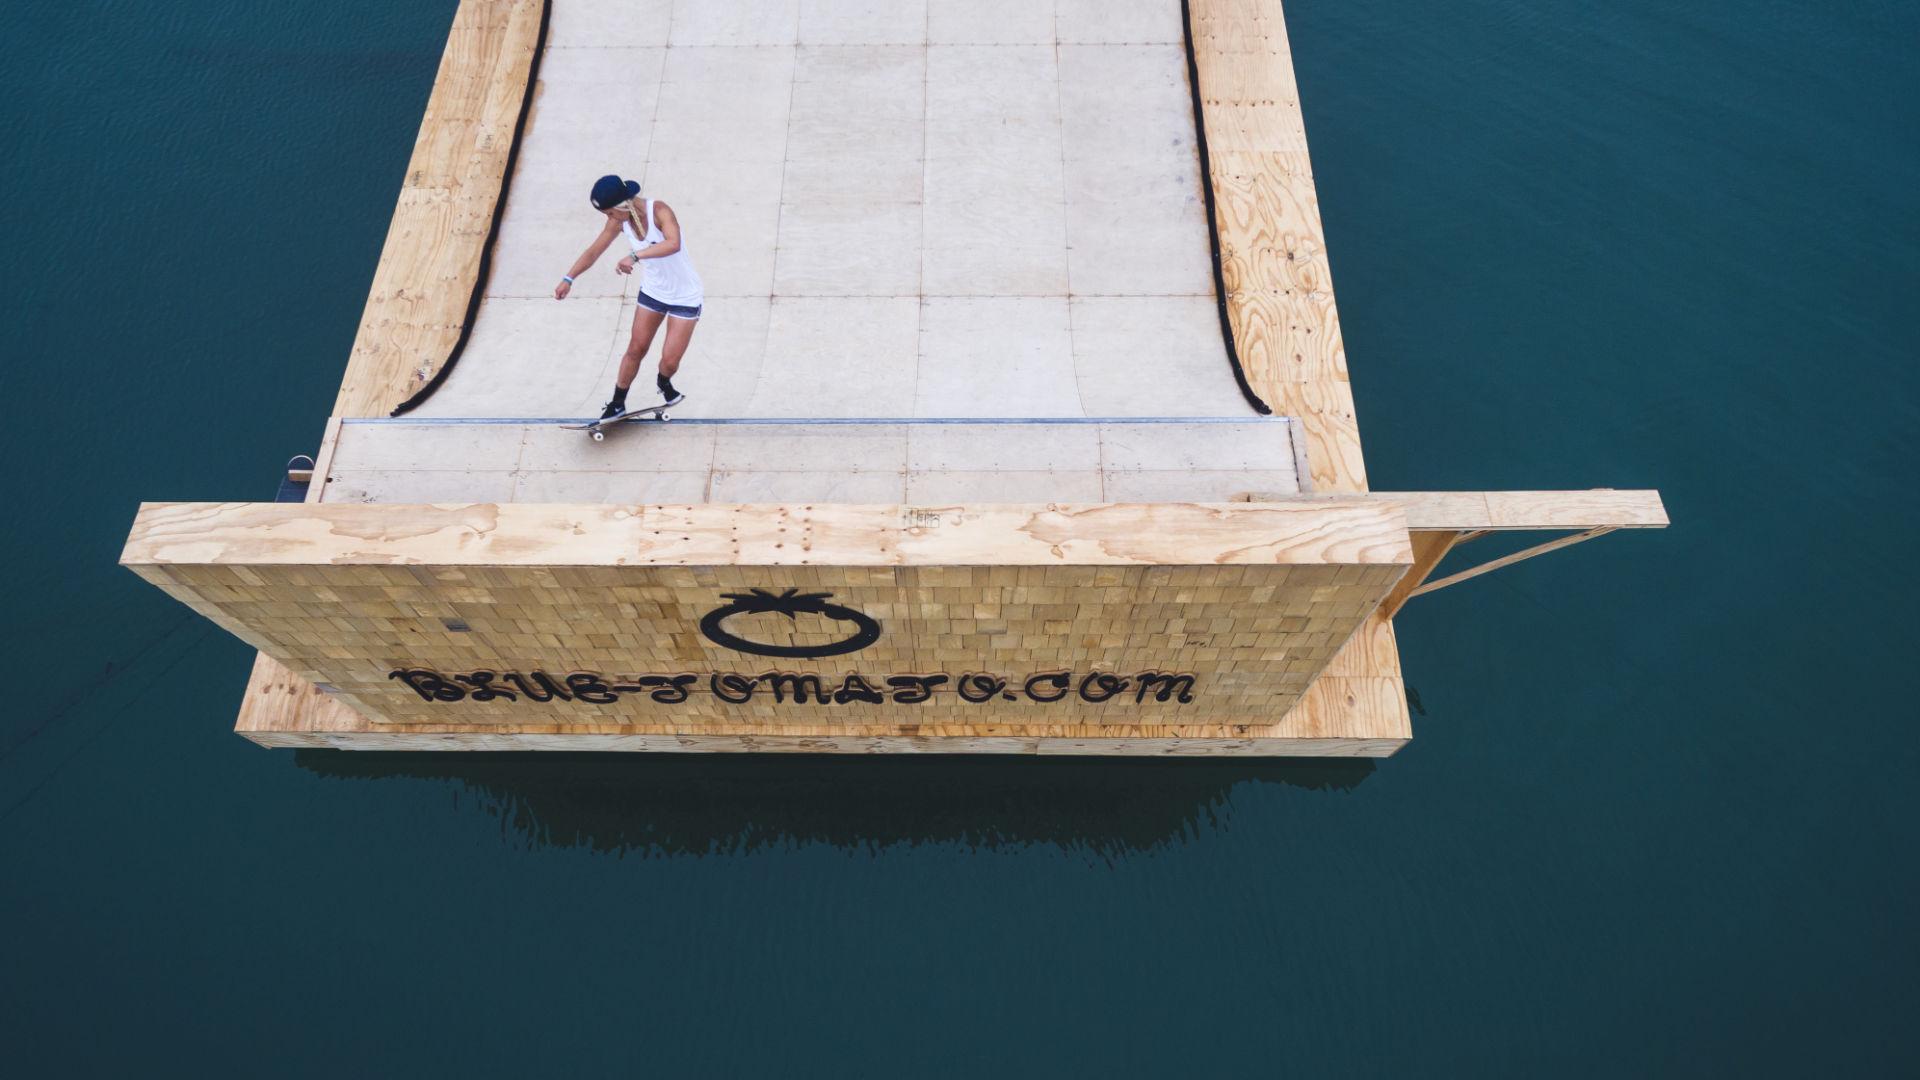 Teamrider Julia Brückler skating on a floating Blue Tomato miniramp